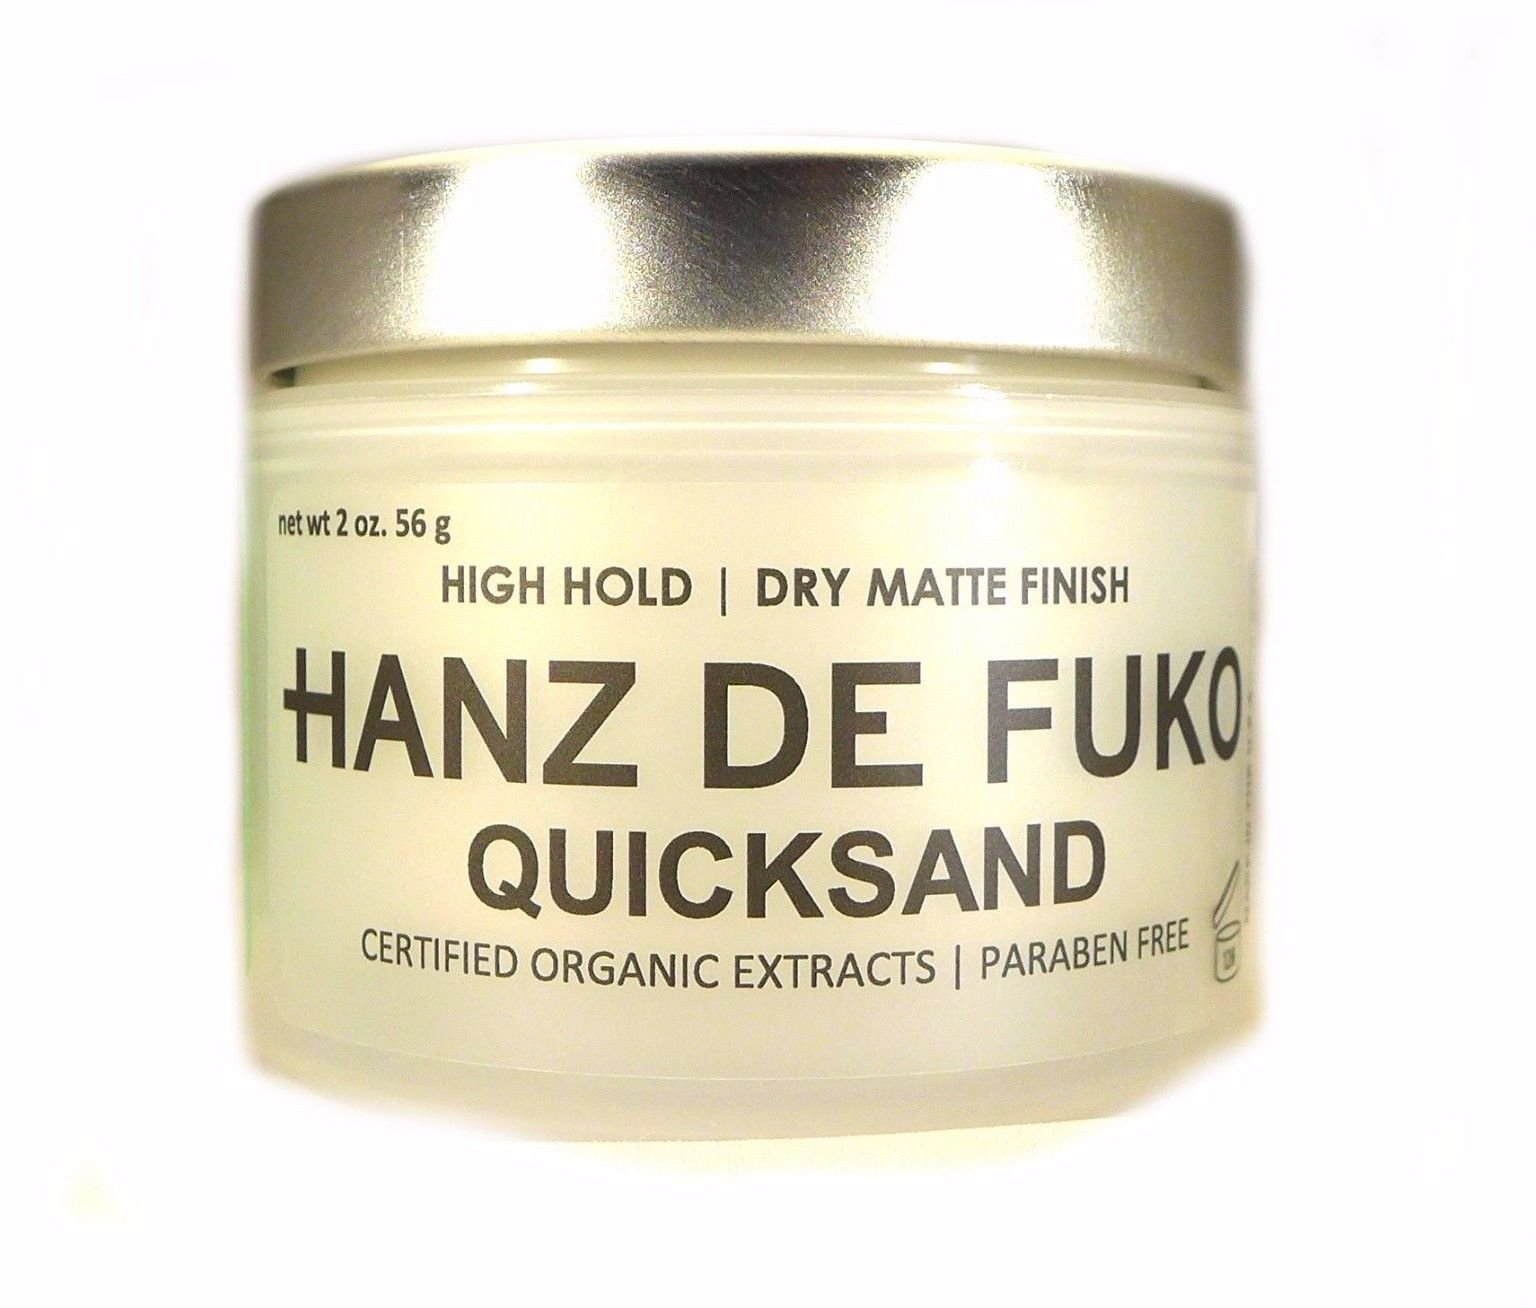 Hanz de Fuko Quicksand, 2 oz.